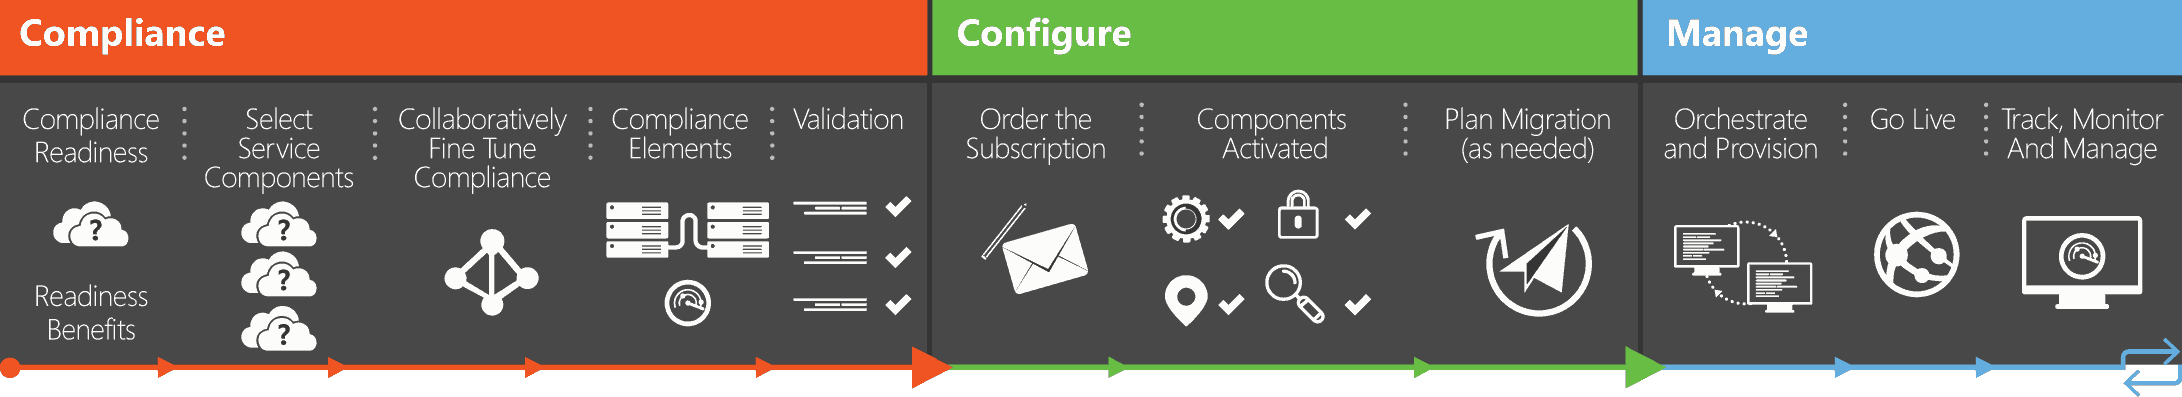 Managed Compliant Office 365 Lumen21